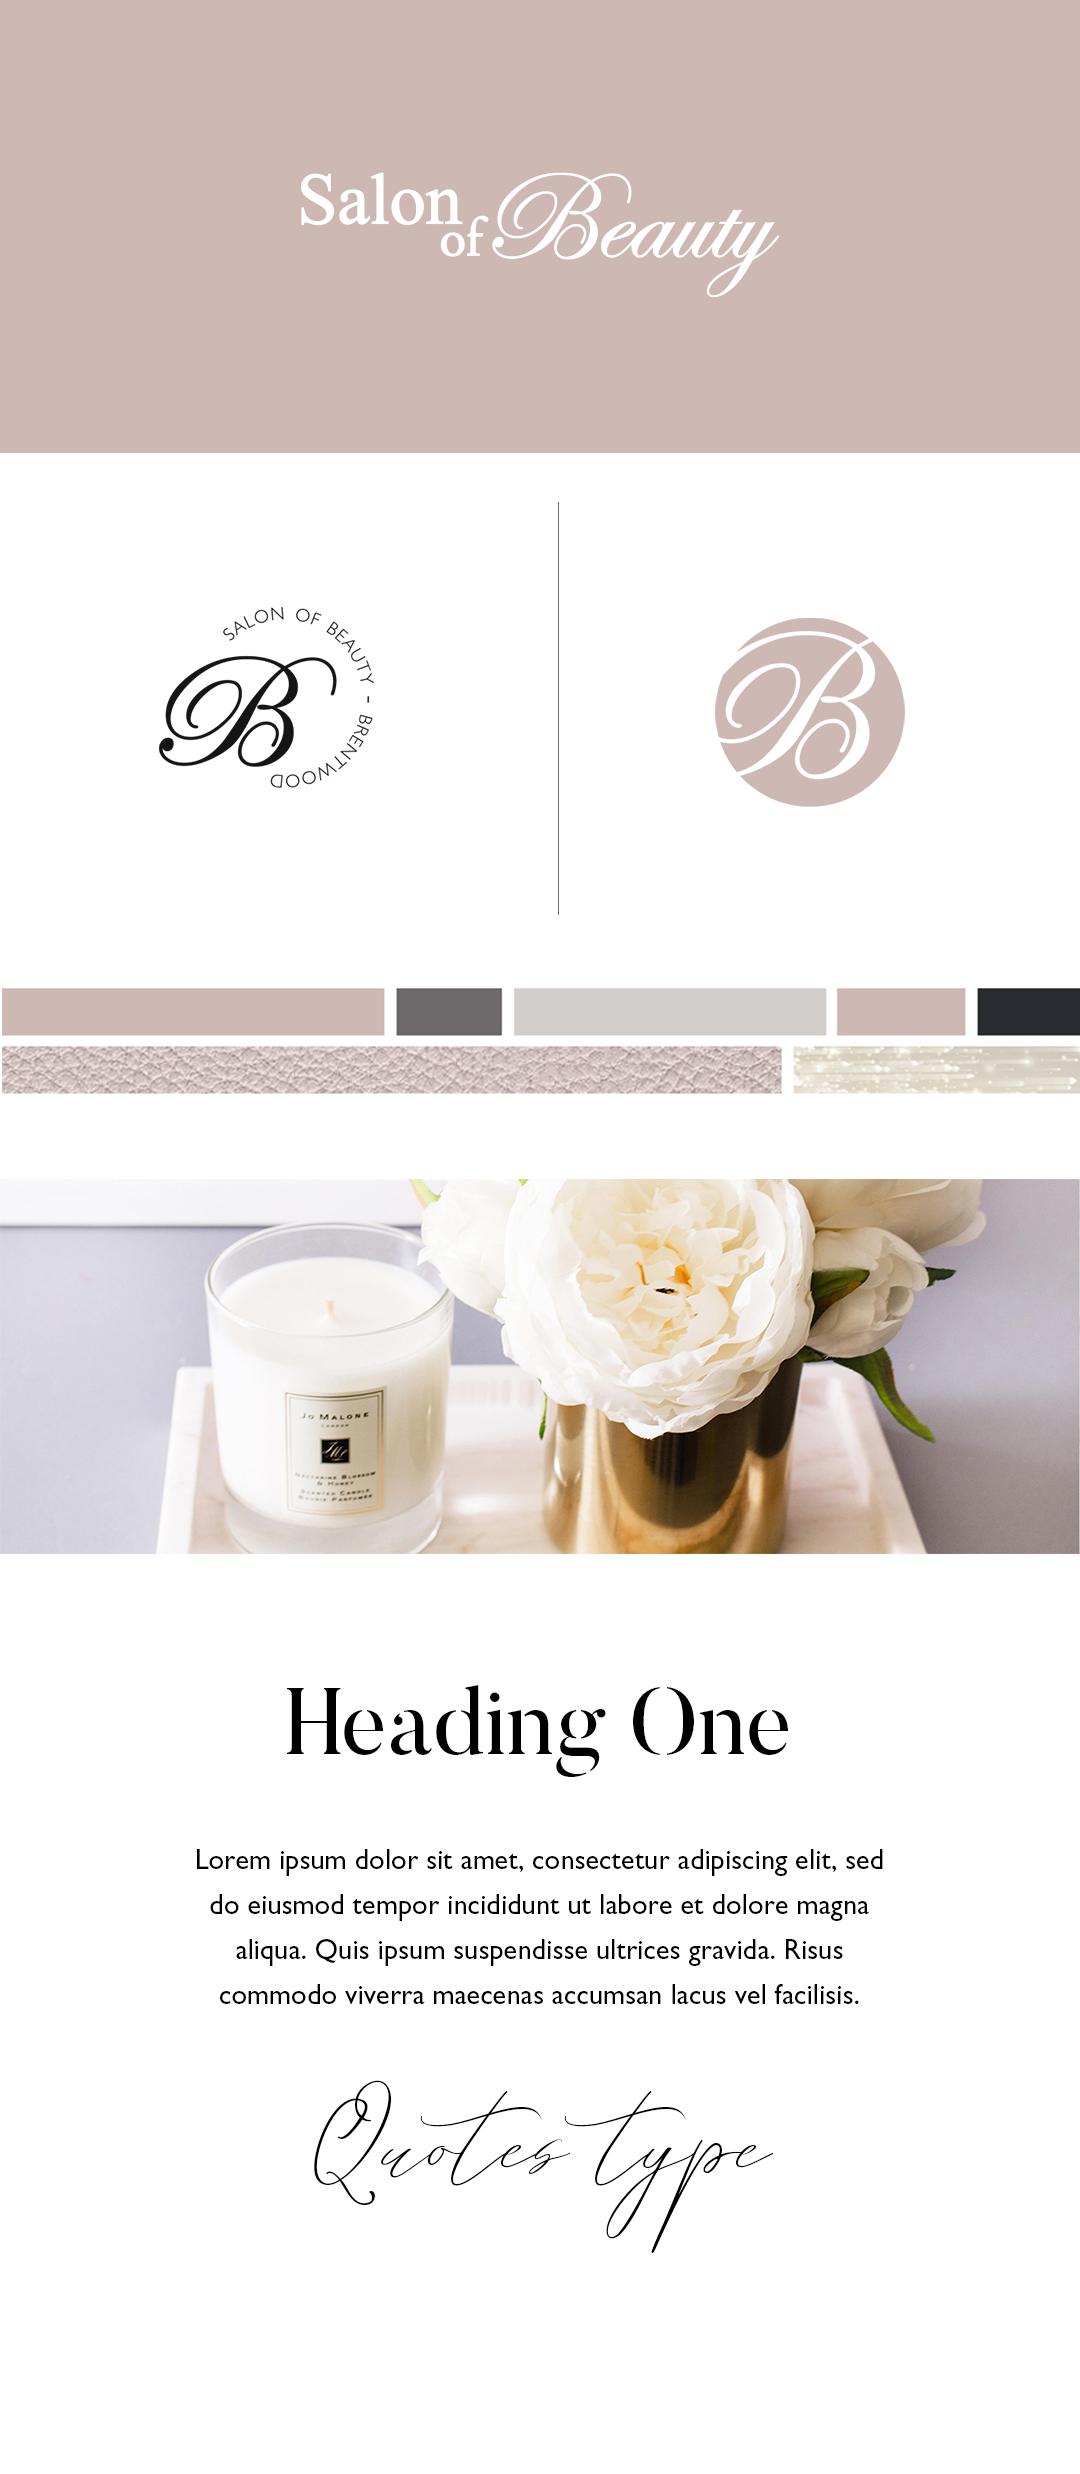 Pink and feminine beauty salon brand identity